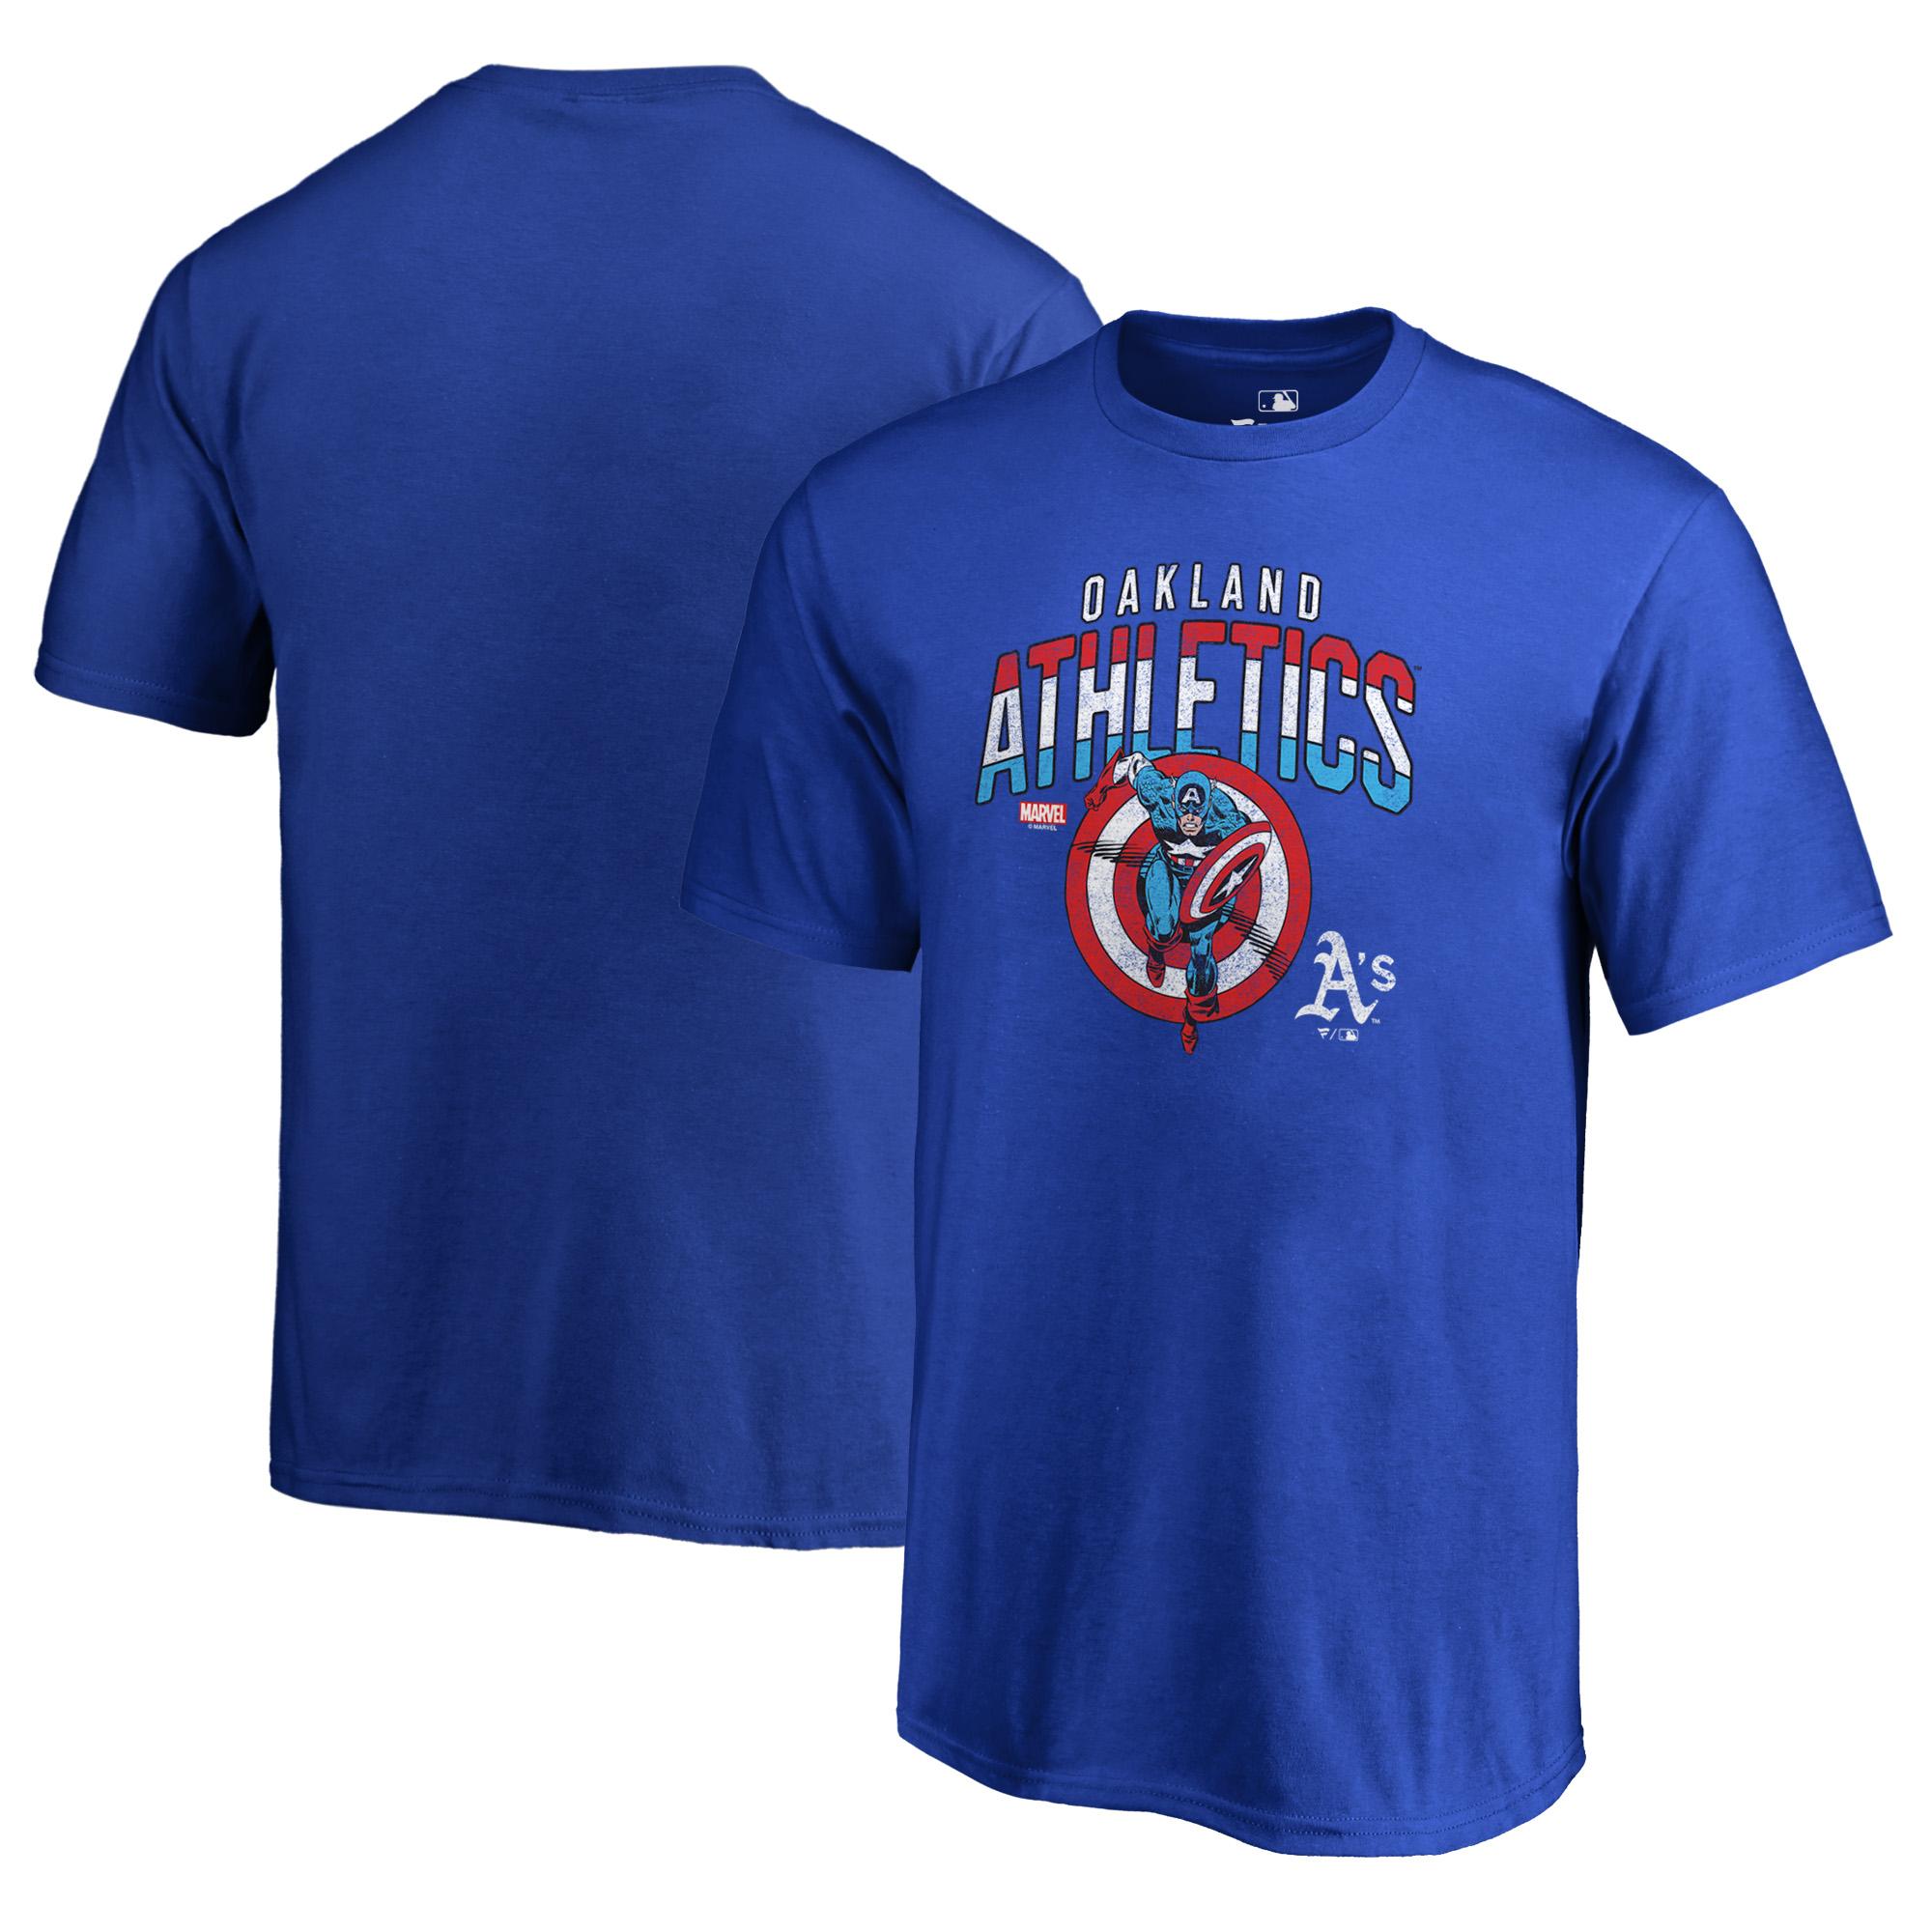 Oakland Athletics Fanatics Branded Youth MLB Marvel Captain's Shield T-Shirt - Royal